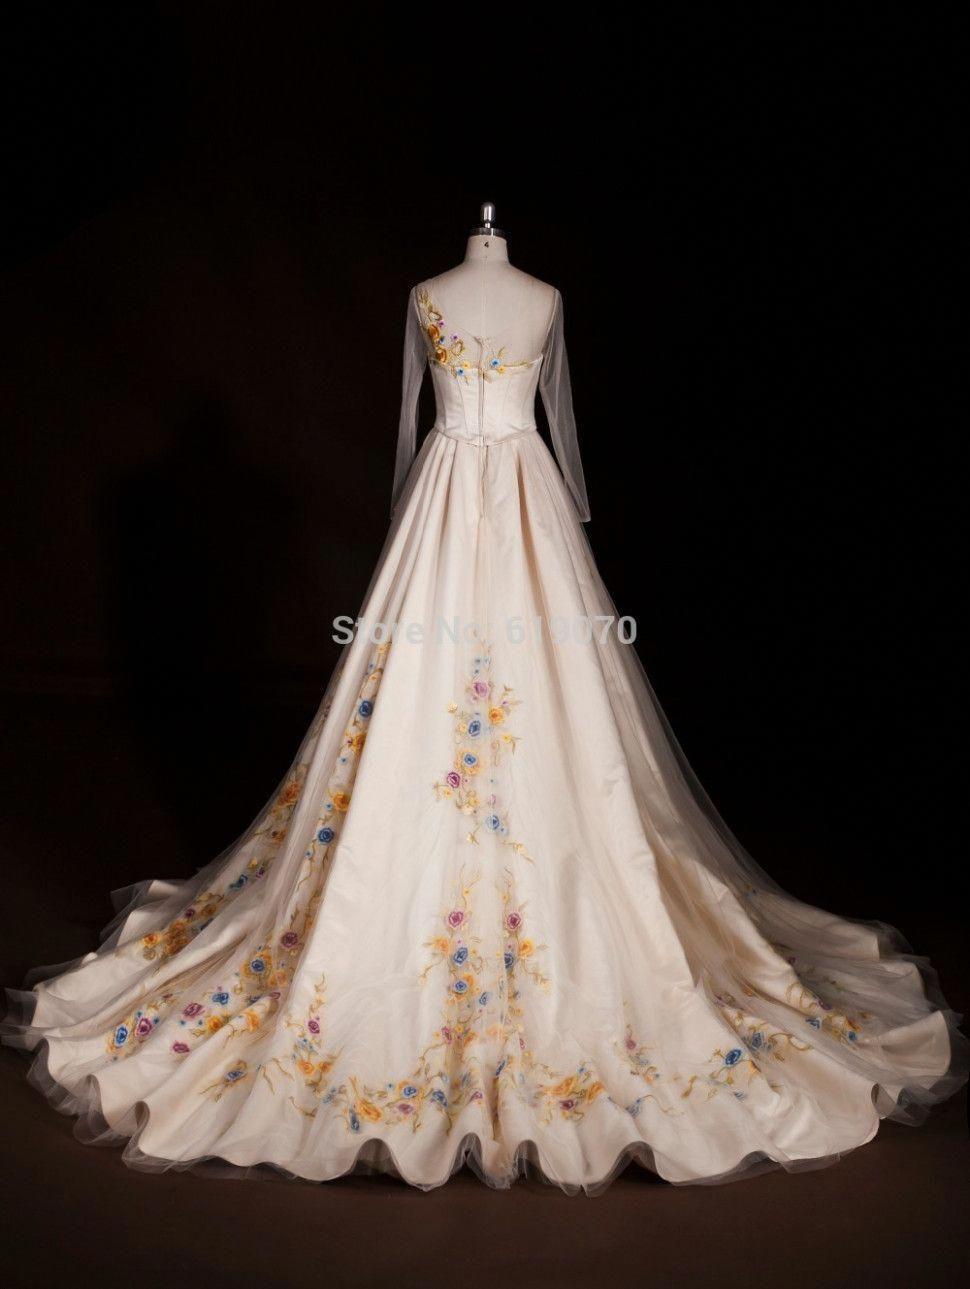 High End Cinderella Wedding Dress Fairy Tale Dream Bridal Gown 2015 Classic Movies Brides Wedding Dresses Cinderella Disney Wedding Dresses Cinderella Dresses